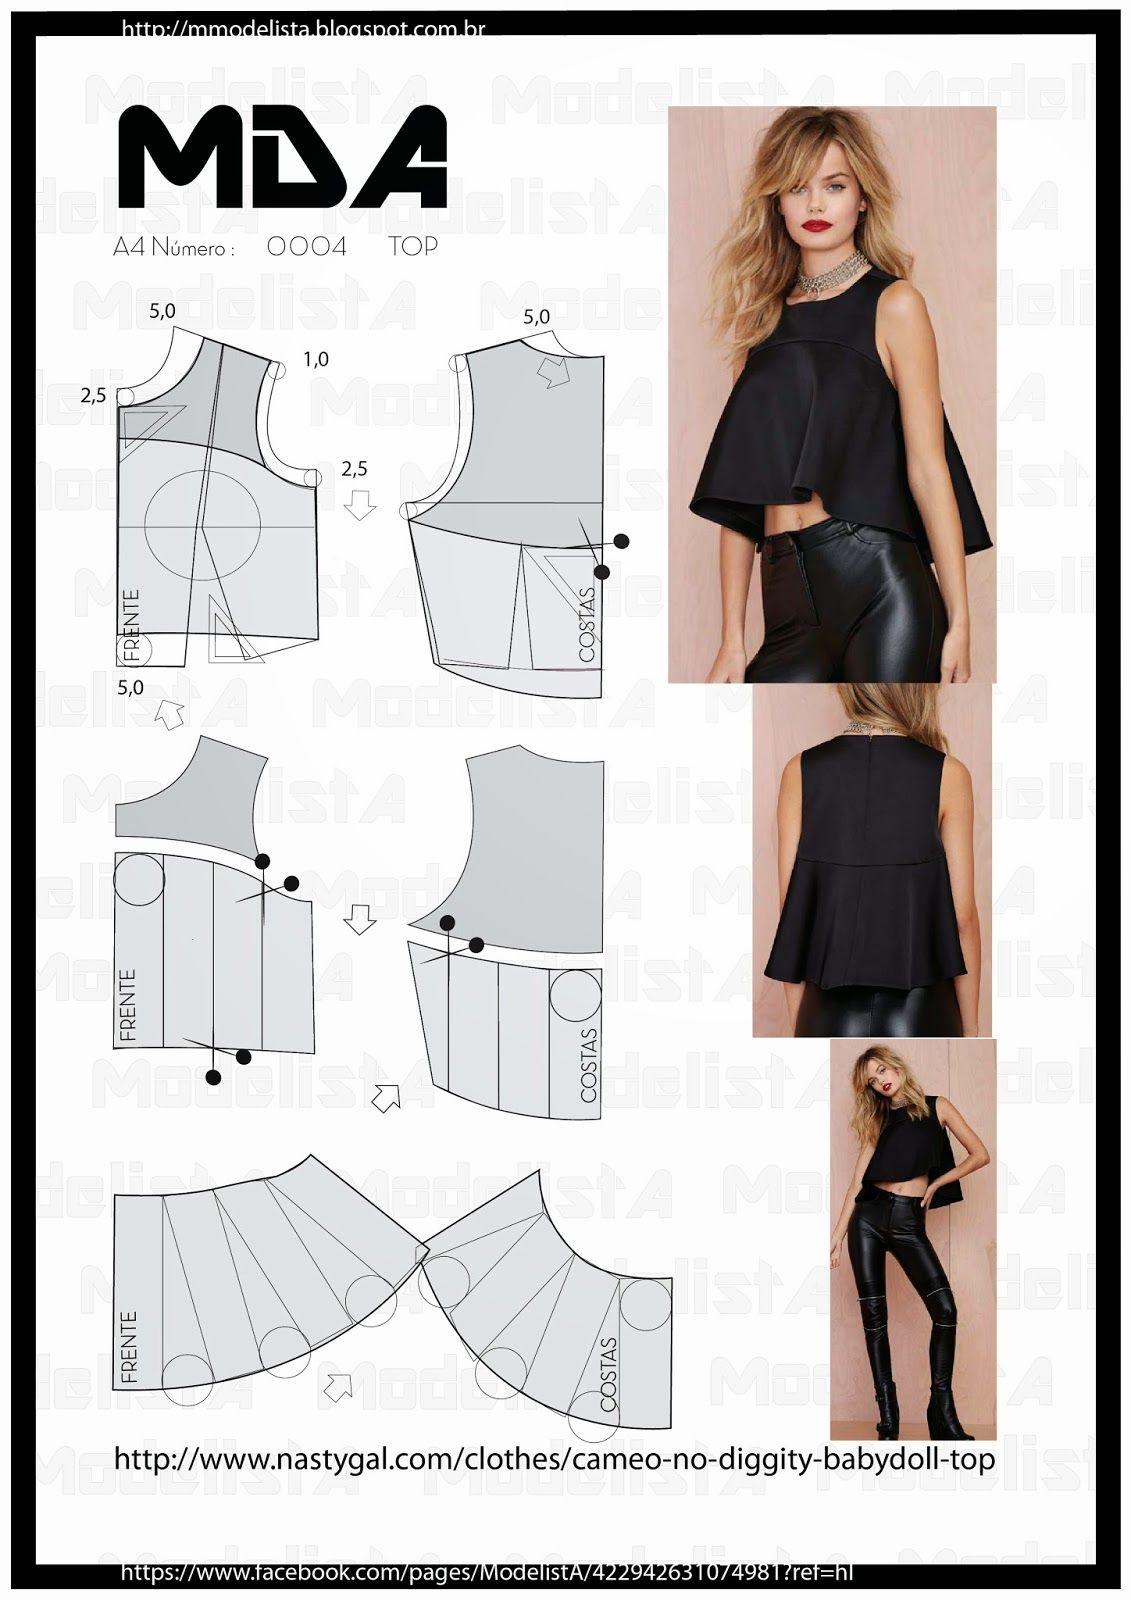 0c9cd40dce ModelistA: Resultados da pesquisa Top | Moldes | Remodelando roupas ...